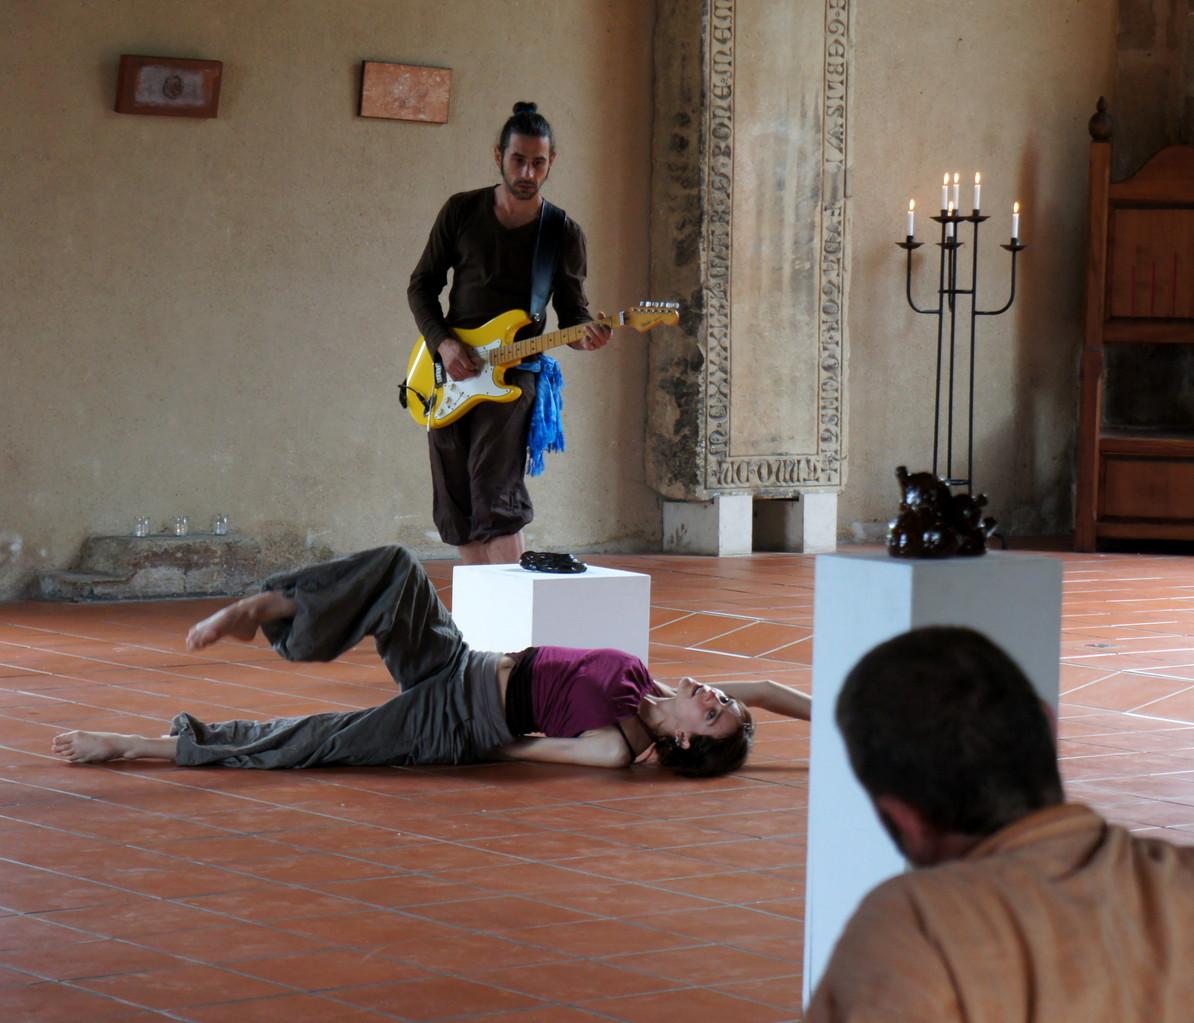 à la guitare Bruno Sporer, super musicien!